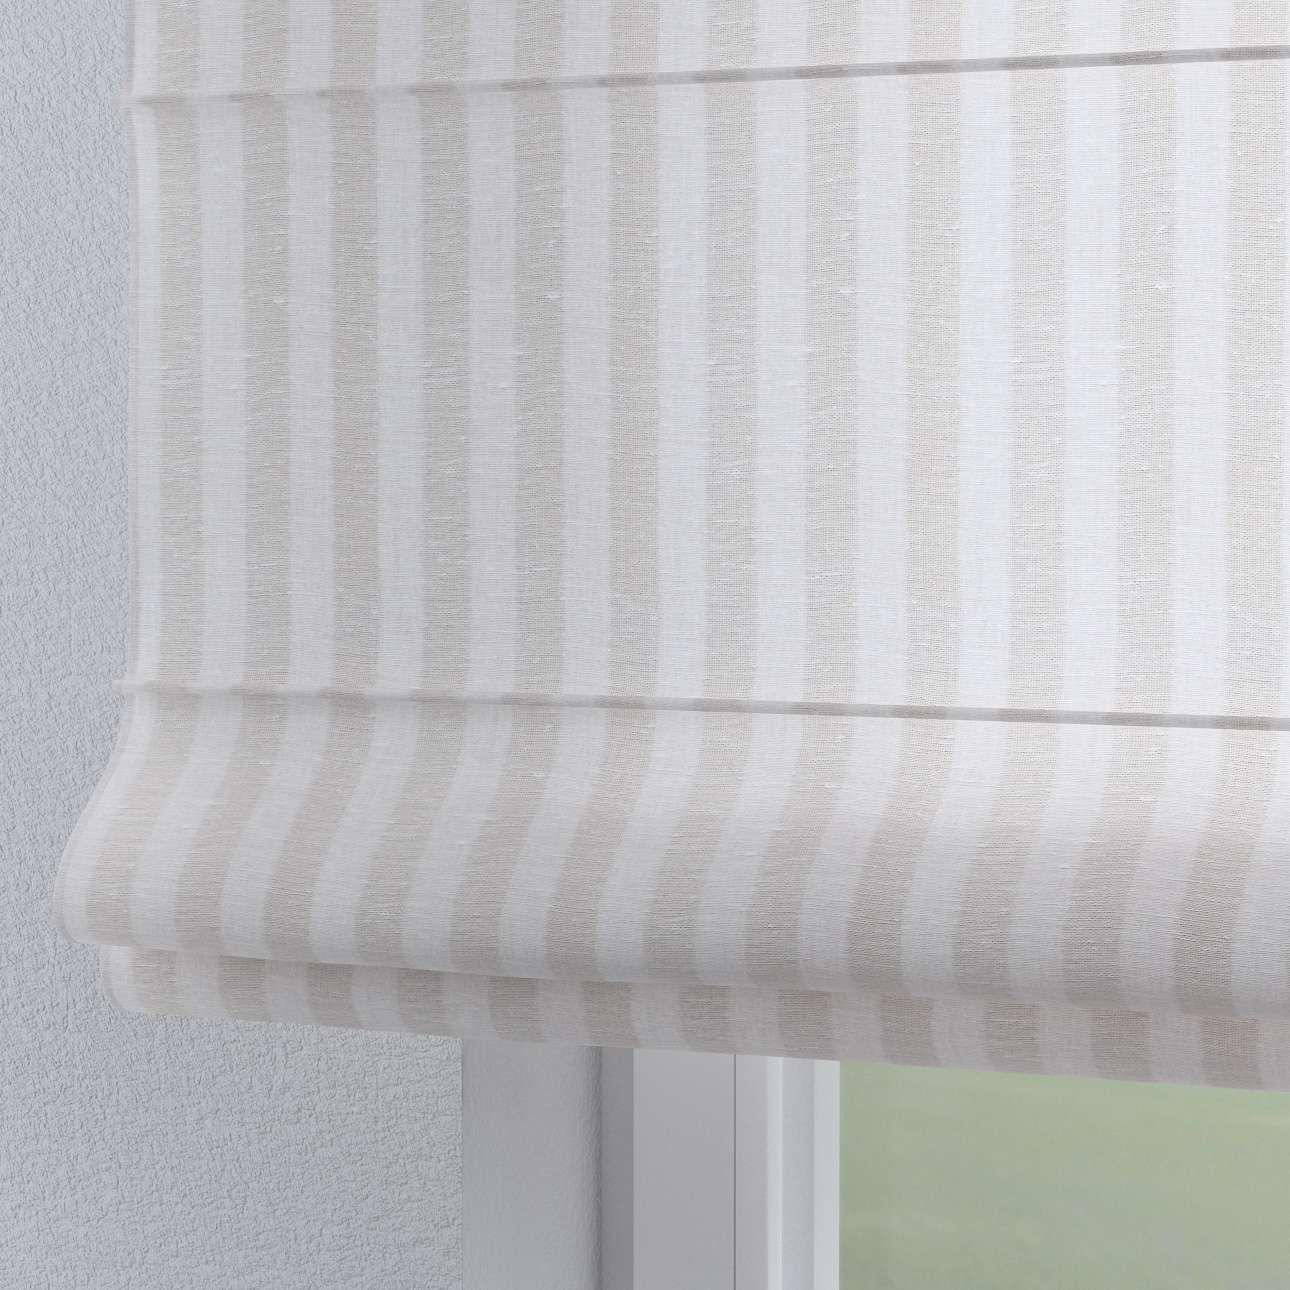 Roleta rzymska Torino 130×170cm w kolekcji Linen, tkanina: 392-03